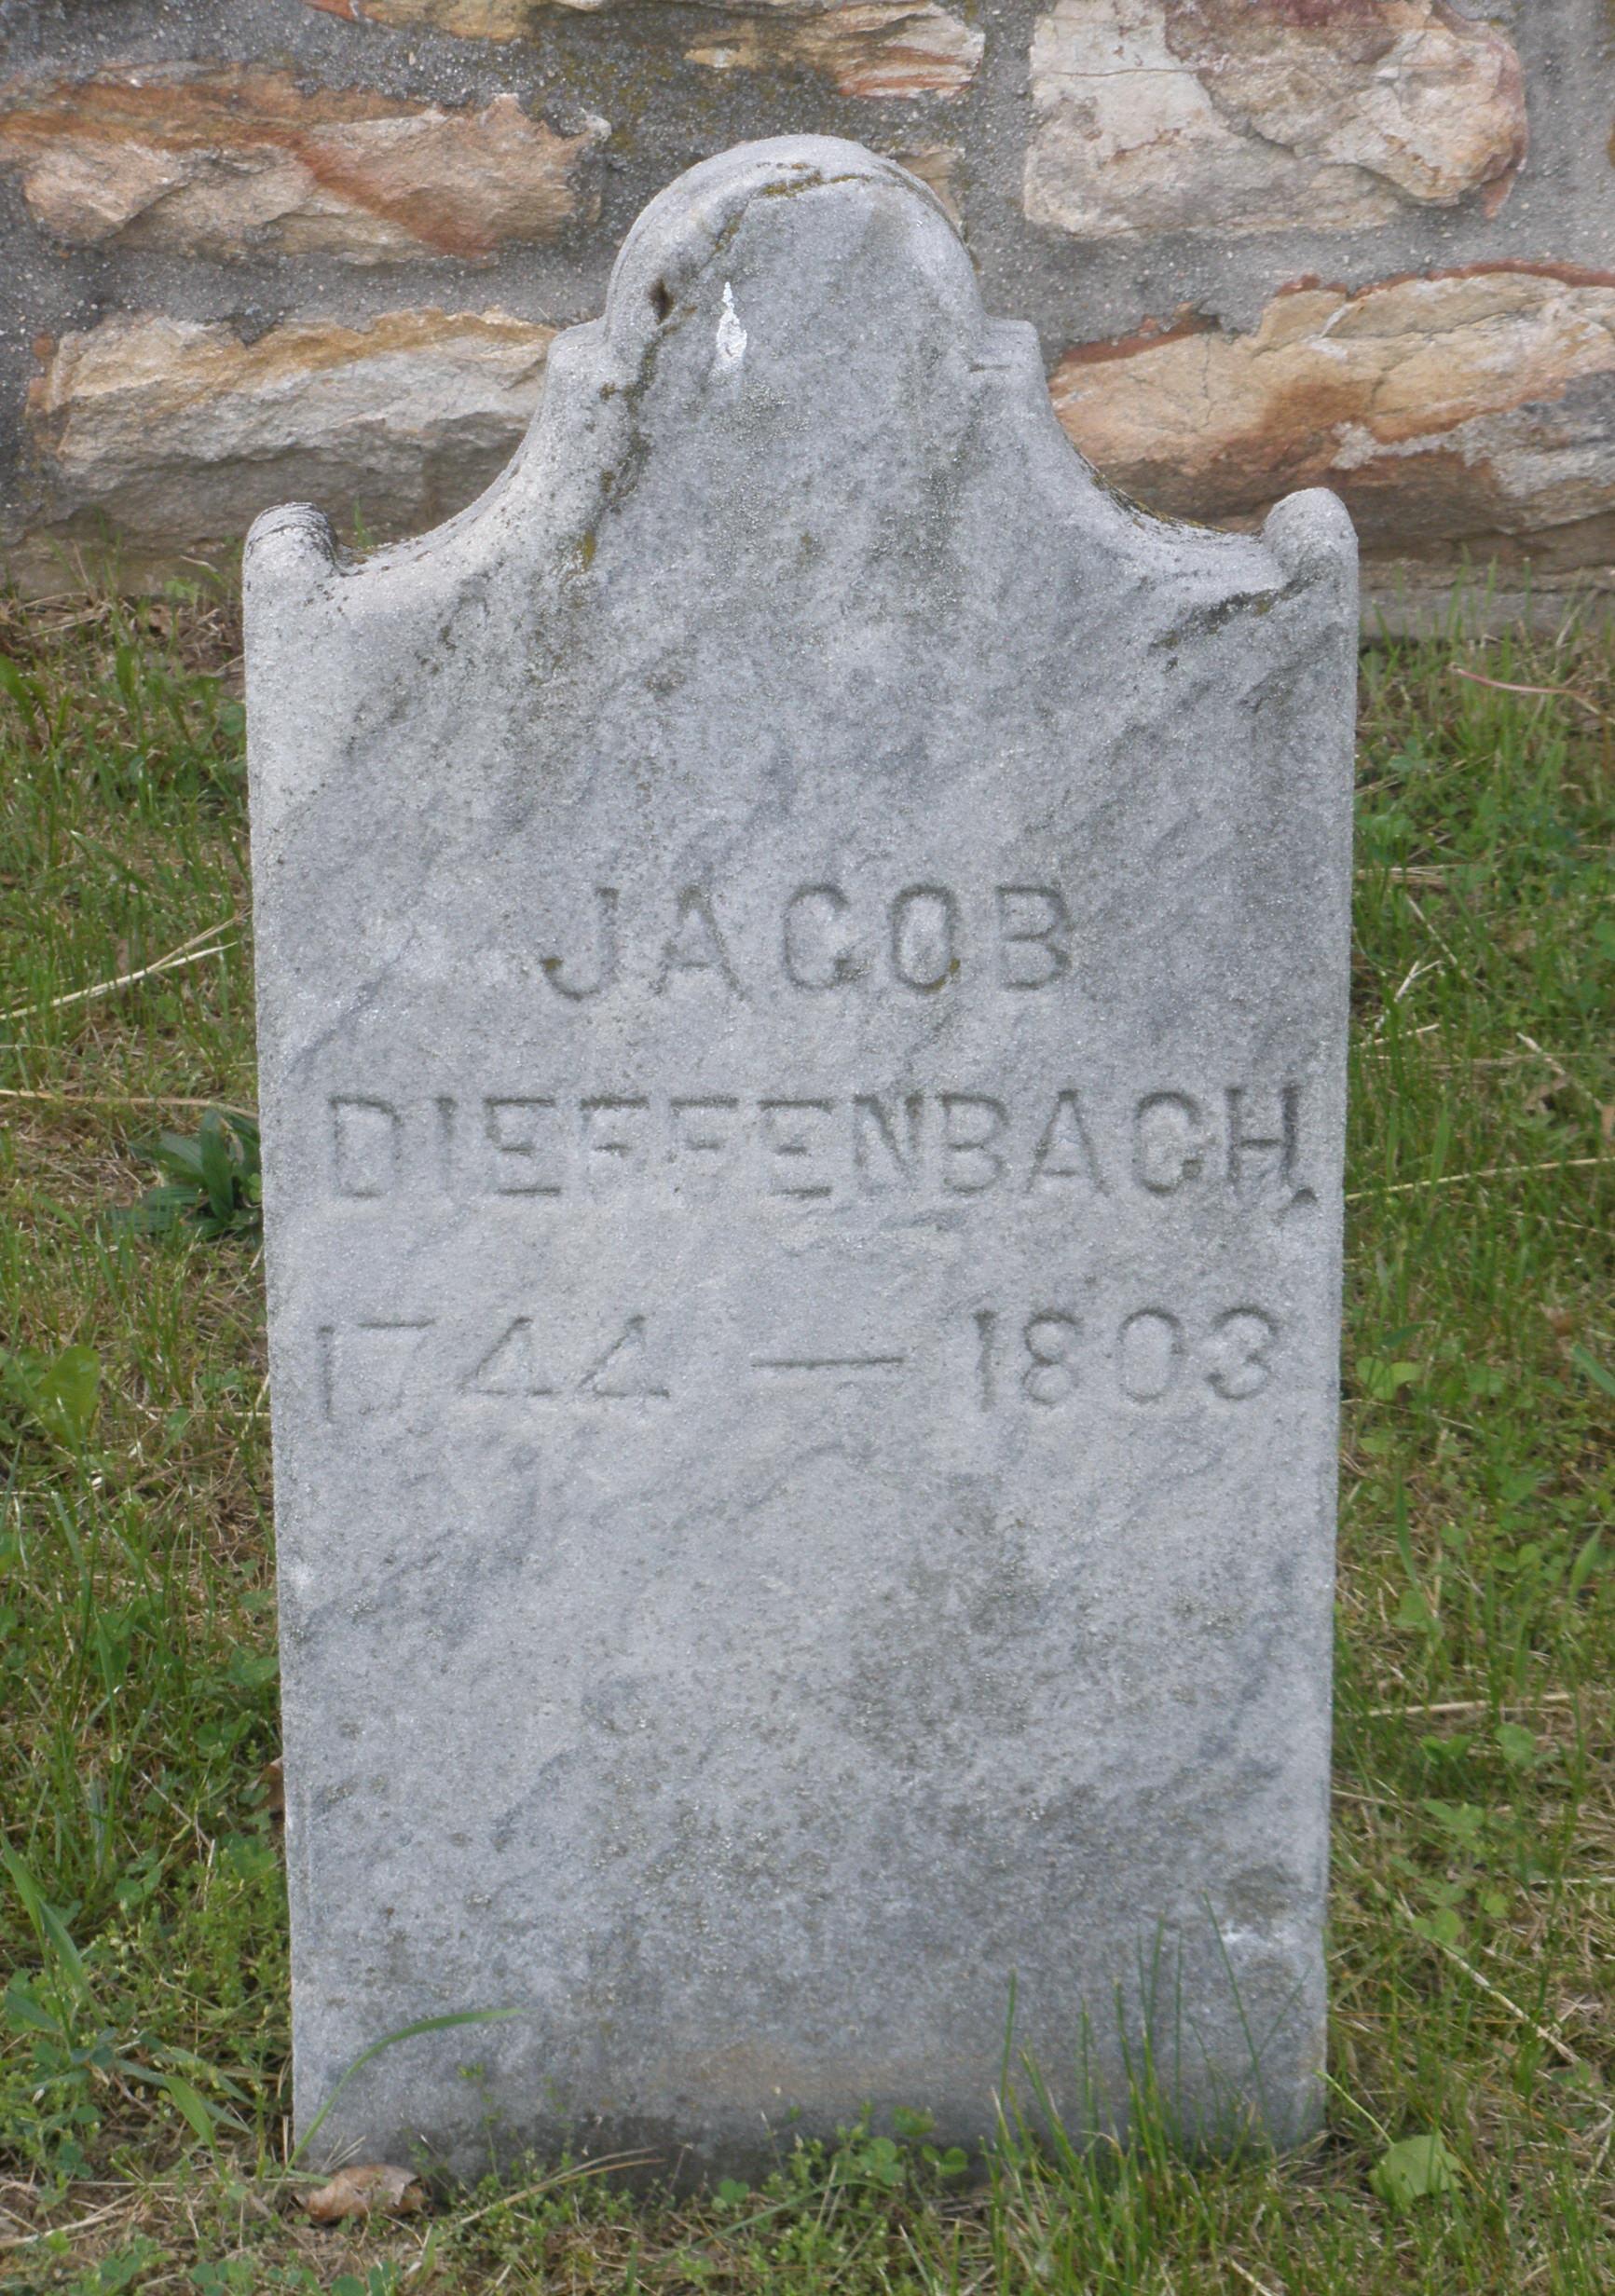 Johann Jacob Dieffenbach